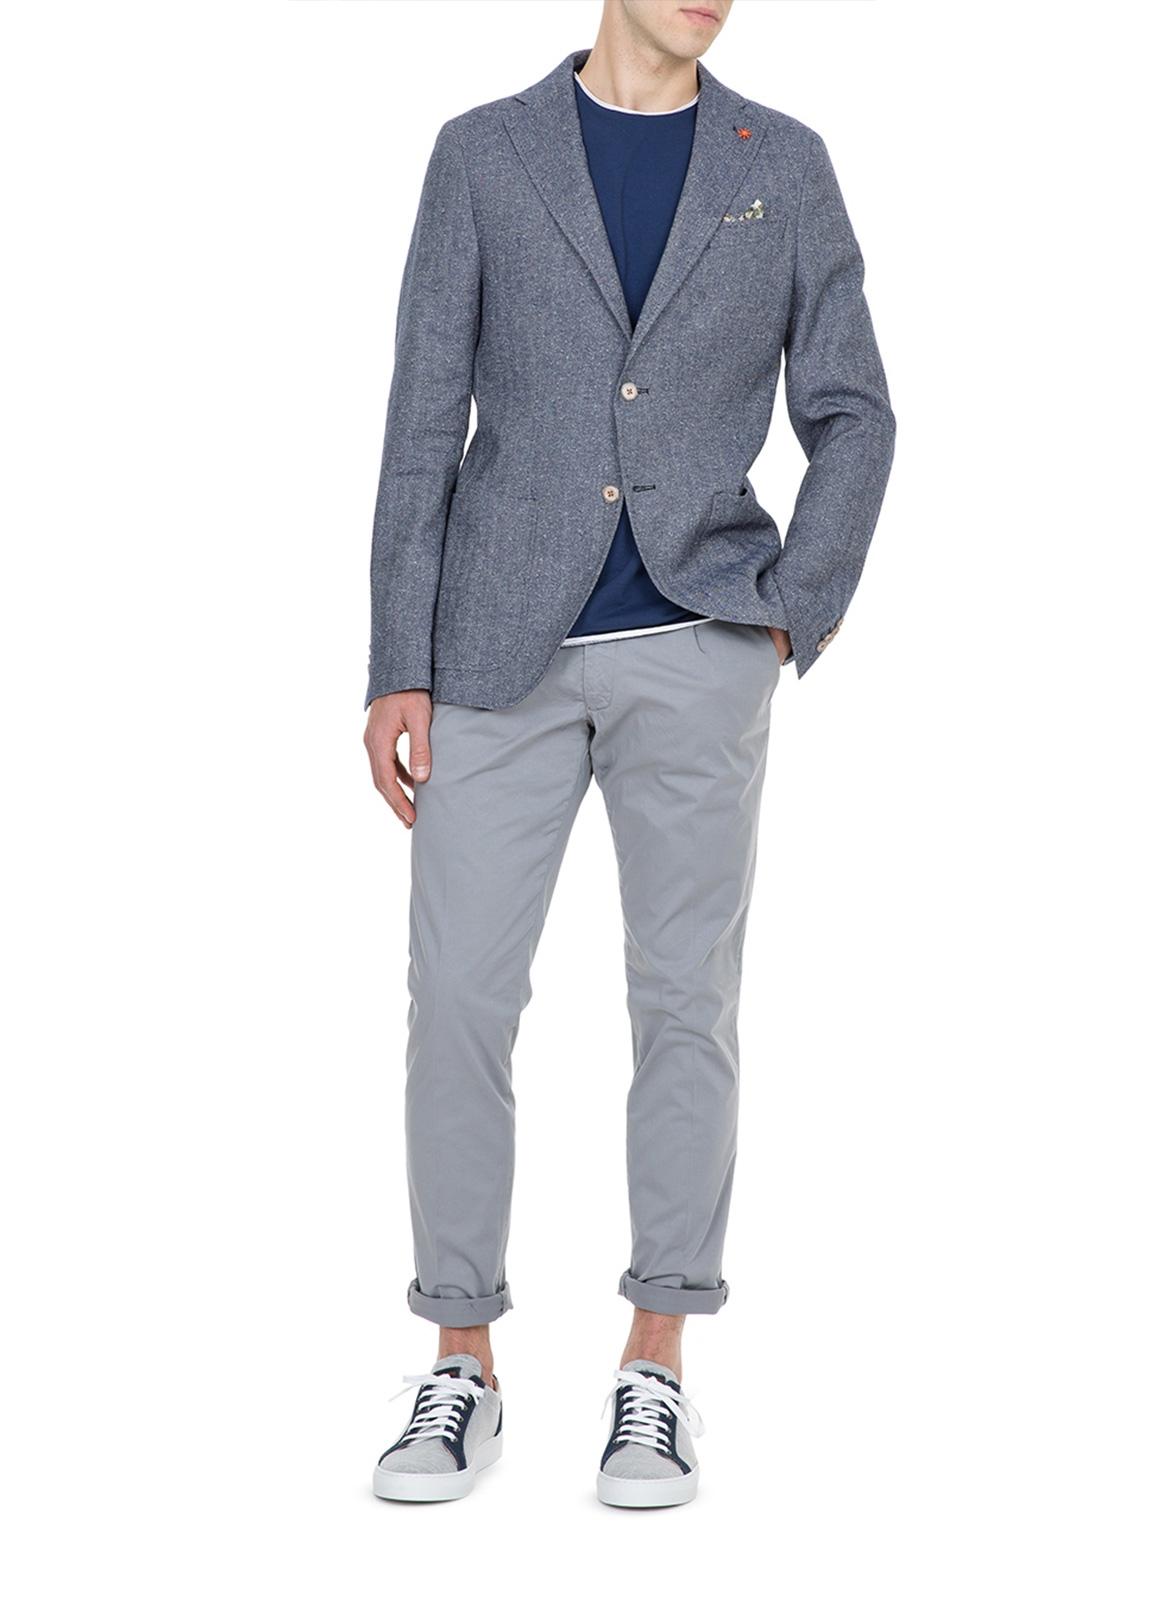 Pantalón chino color gris con pinzas. 100% Algodón. - Ítem1